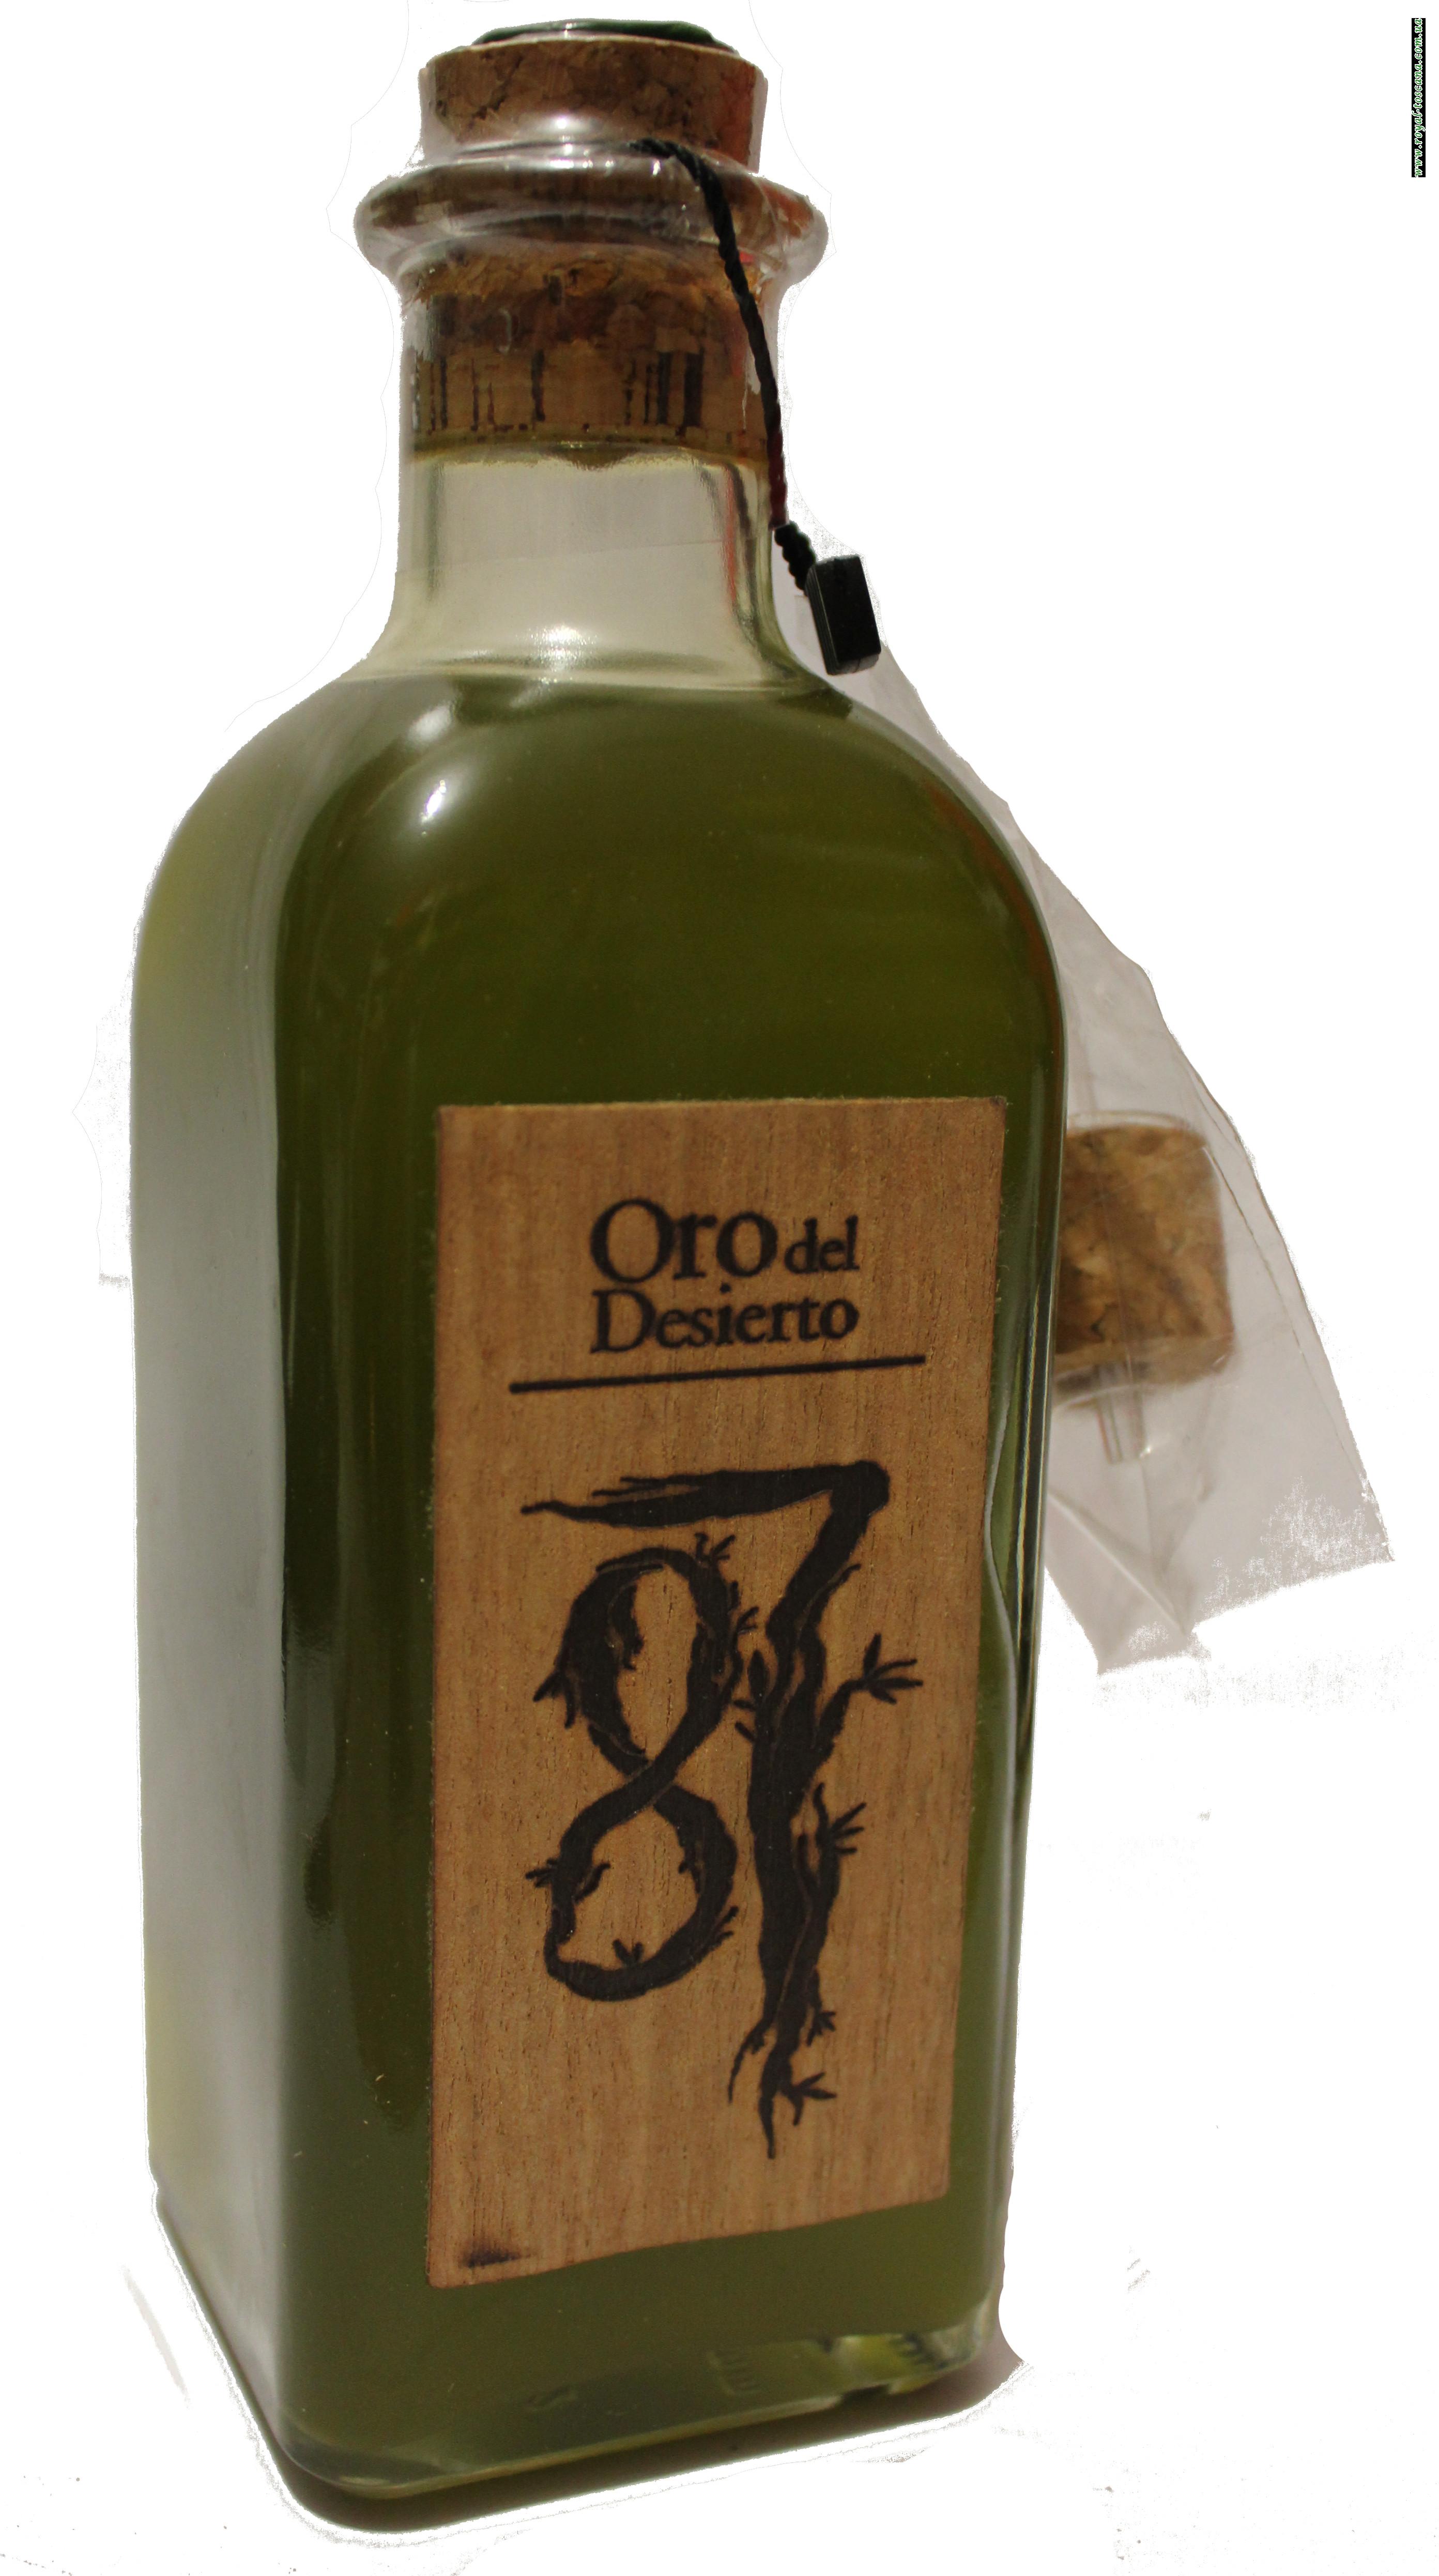 Оливковое масло Oro del Desierto: Cosecha 87